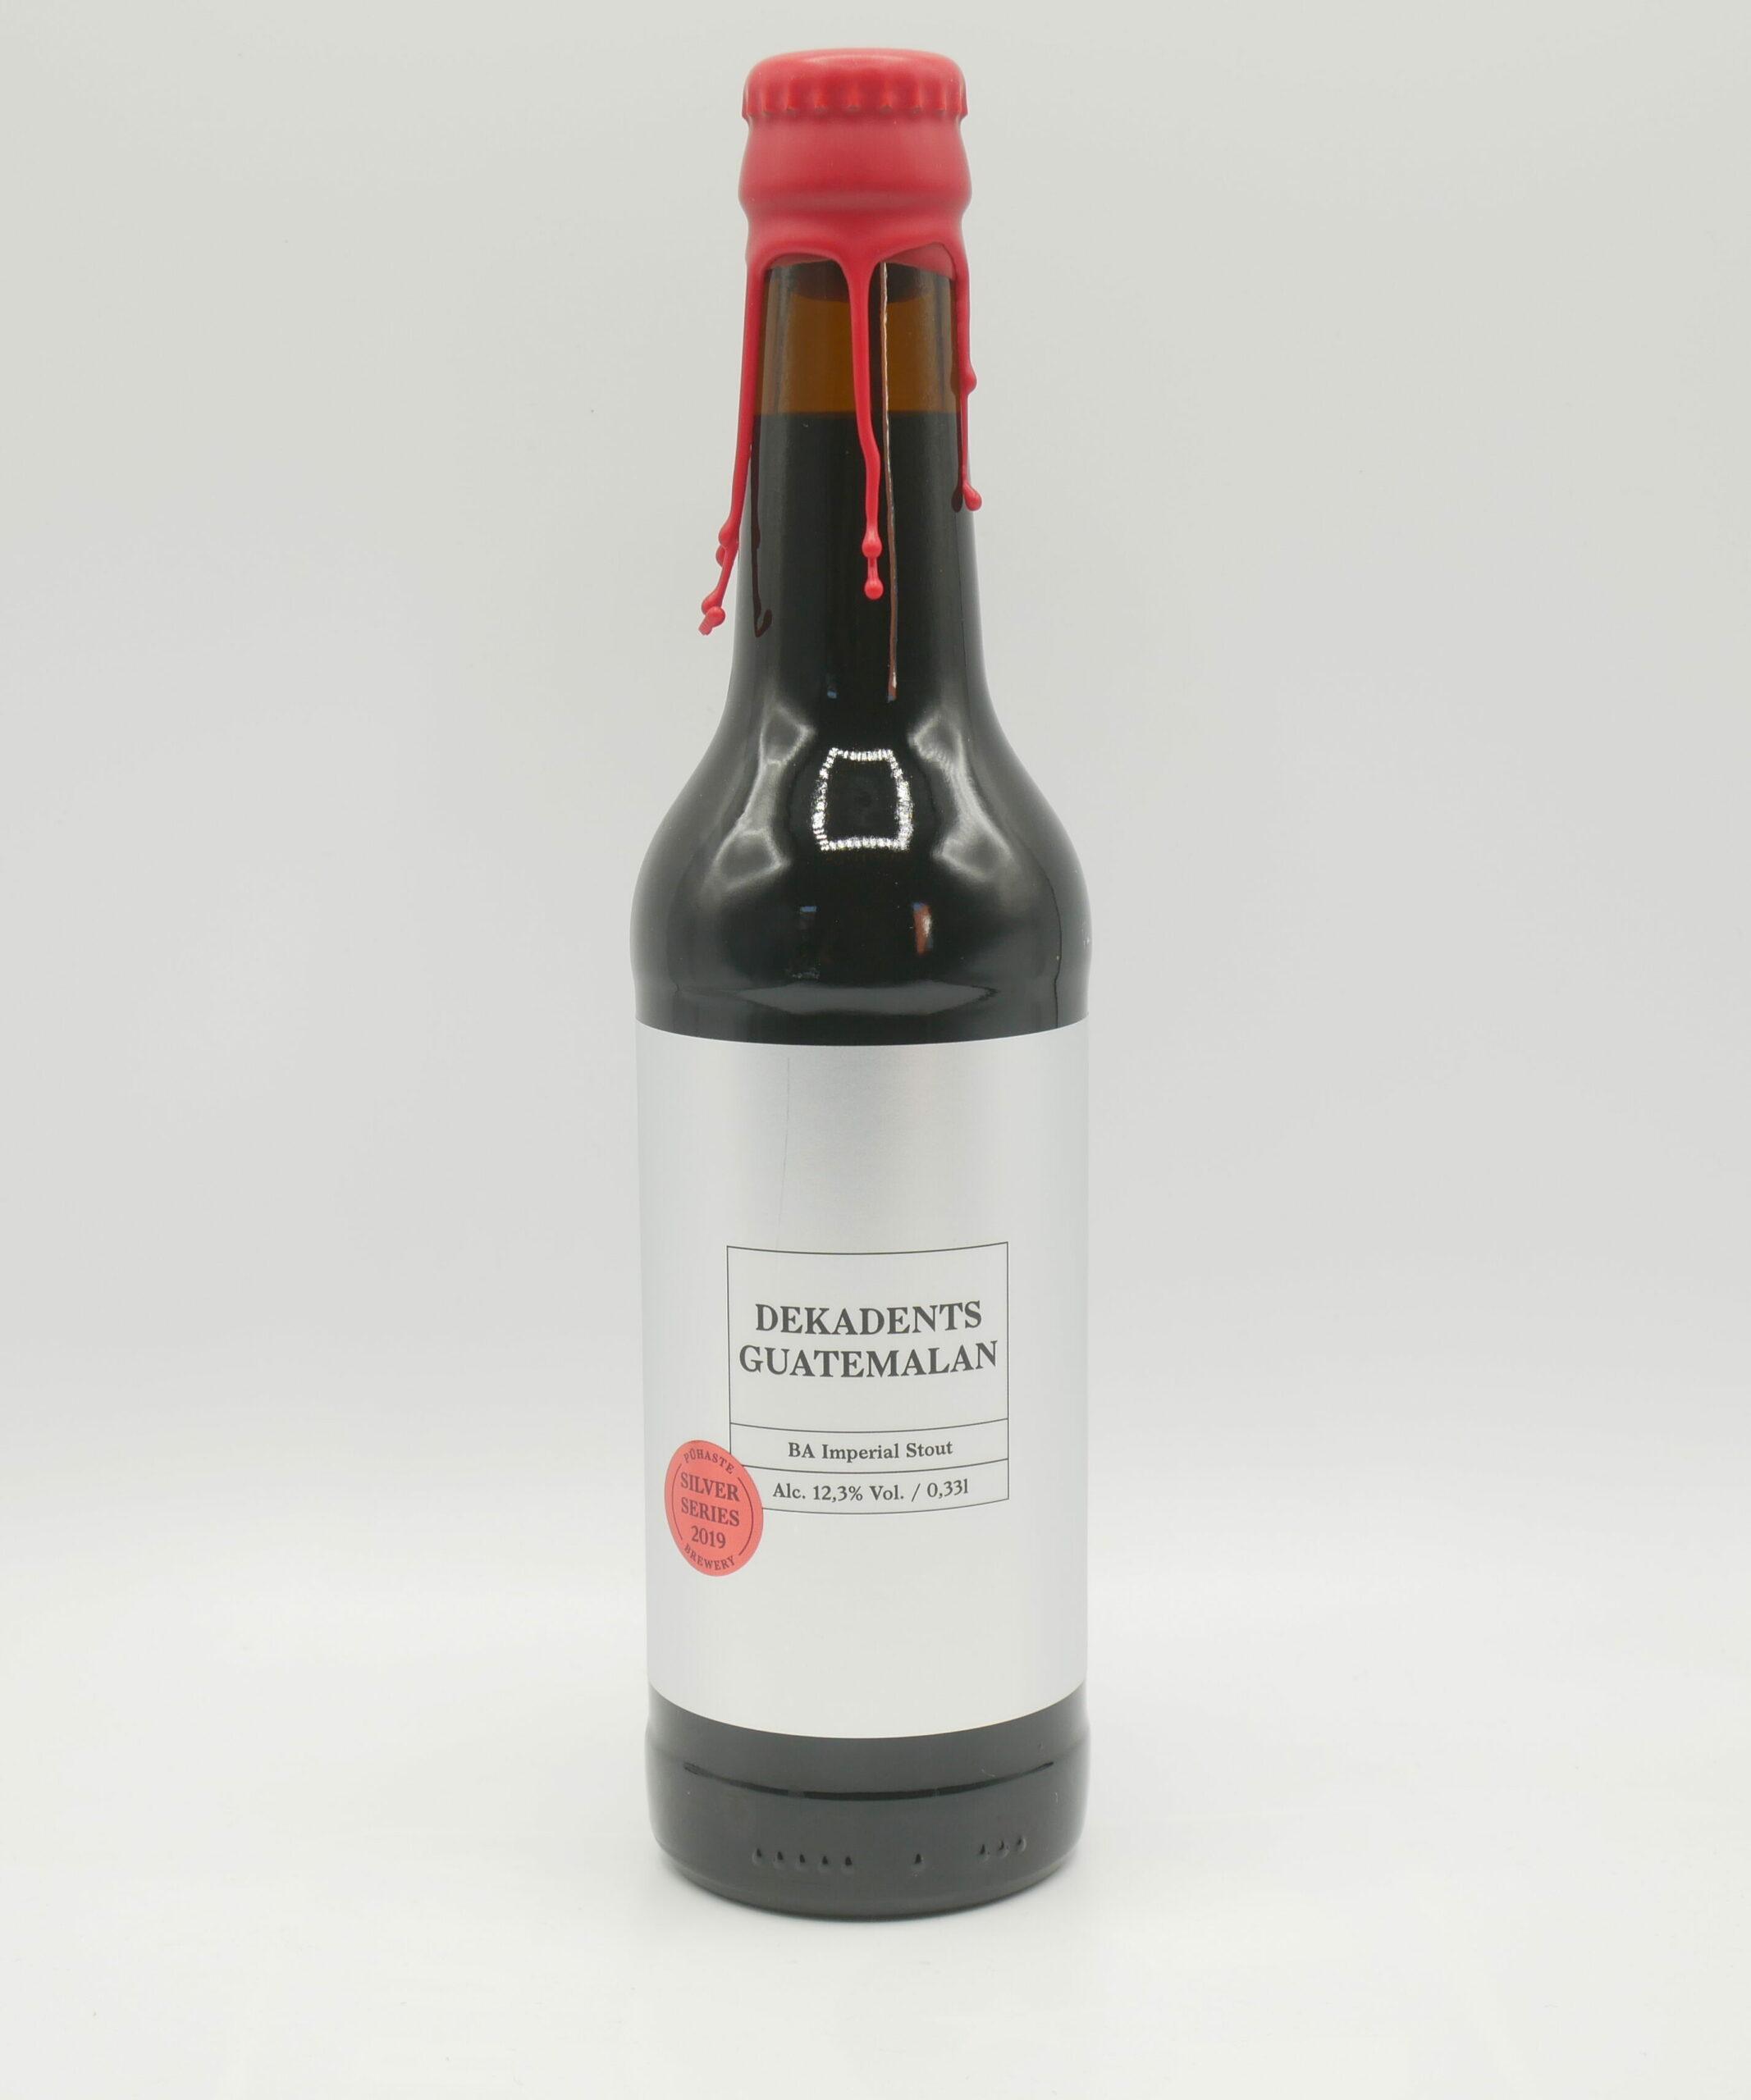 Image Dekadents Guatemalan Rum Ba